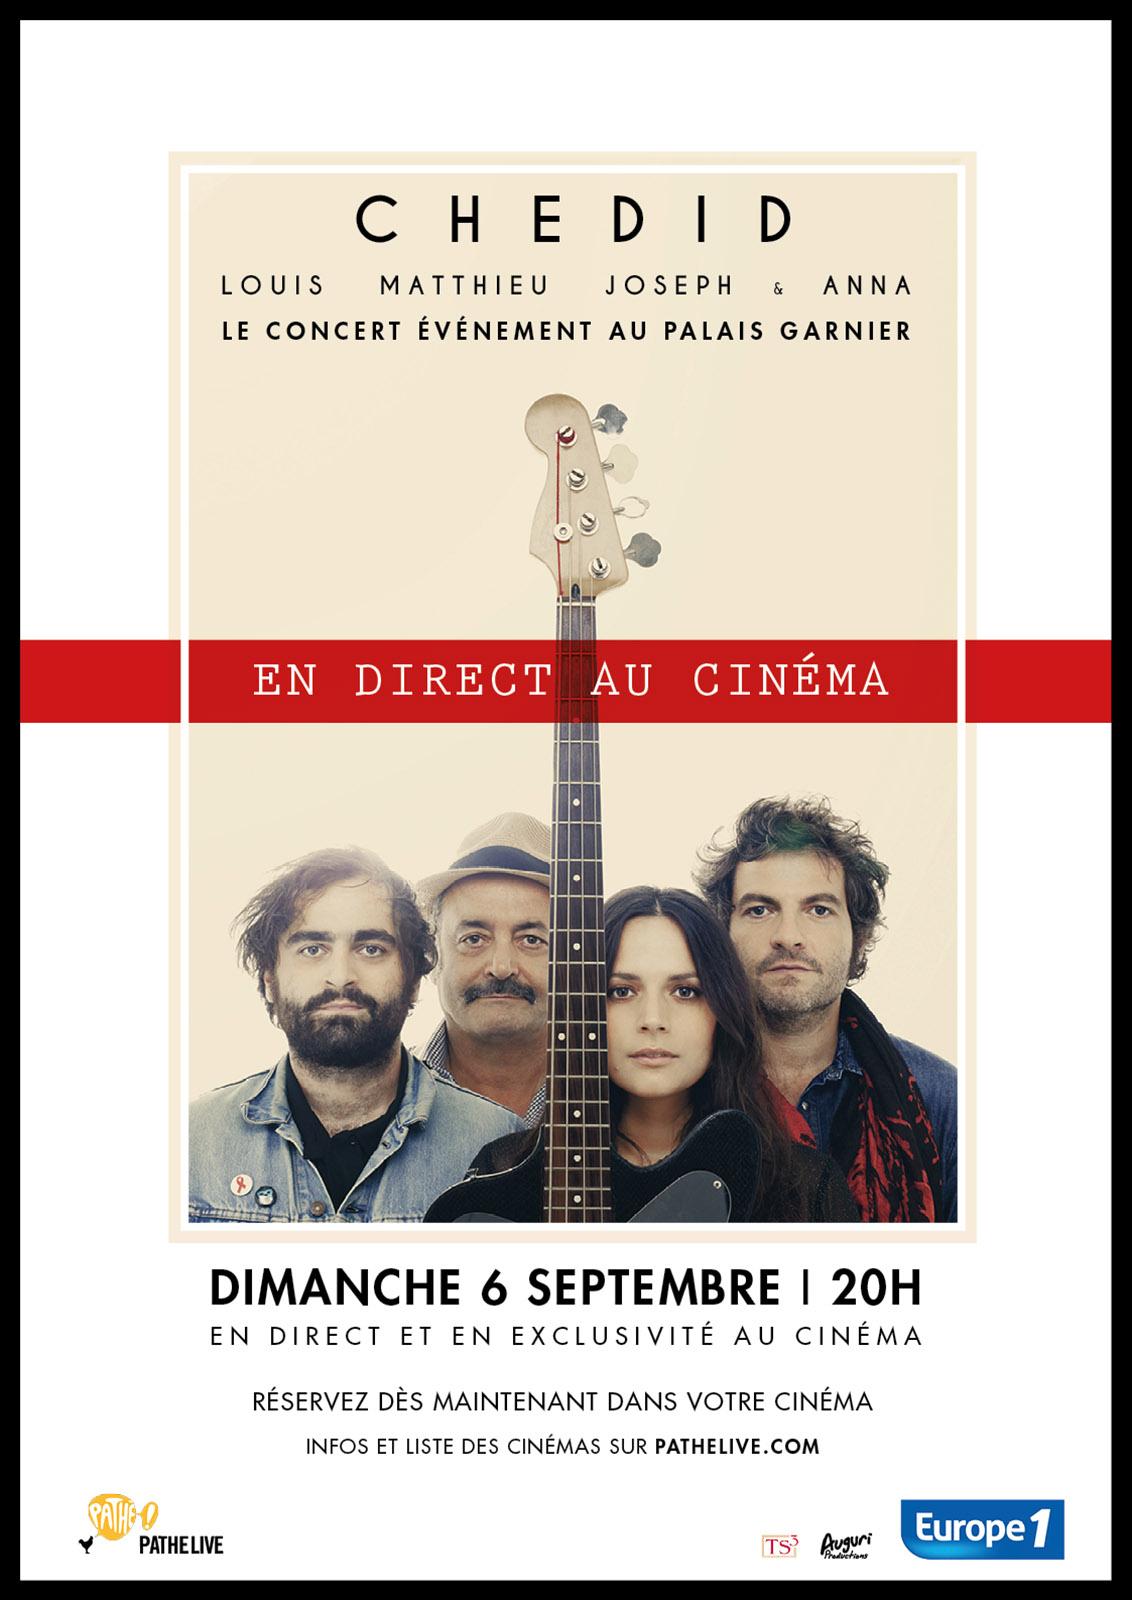 Télécharger La Famille Chedid (Pathé Live) VF Complet Uploaded